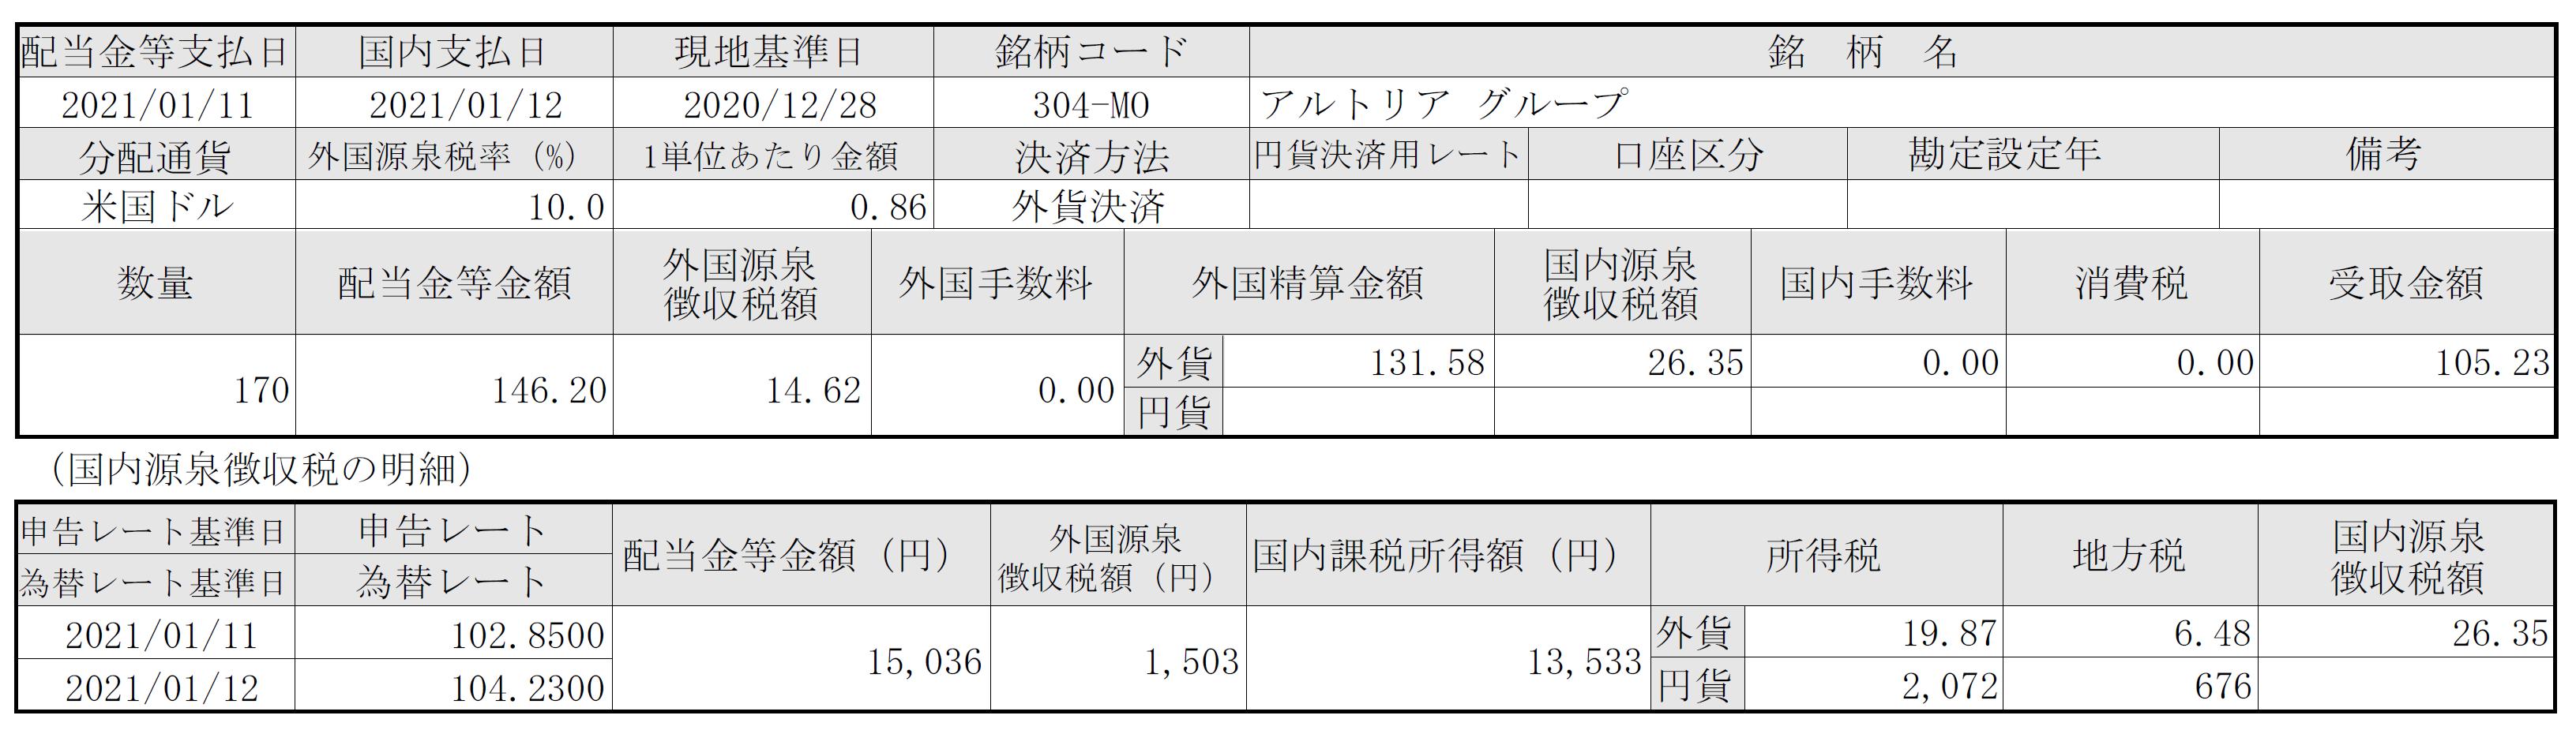 f:id:hodo-work:20210117184415p:plain